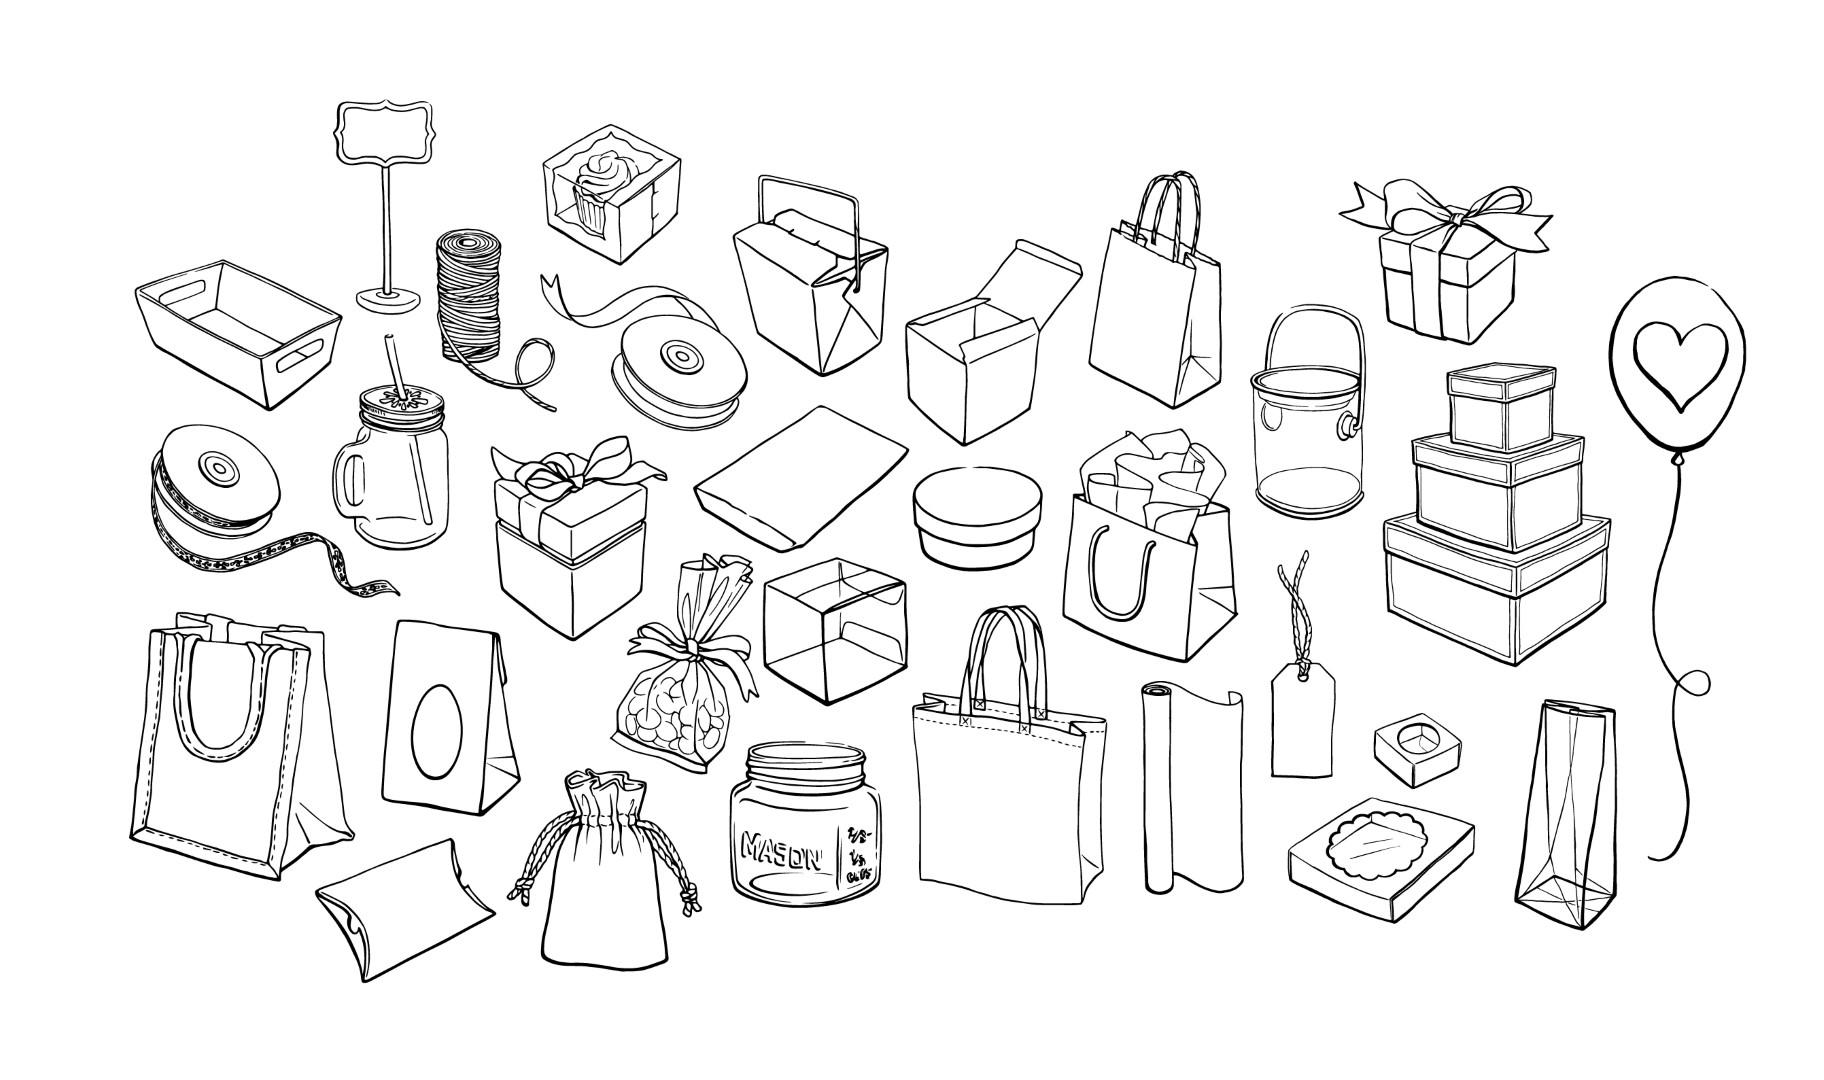 Creative-Bag-Line-Drawings-TOGETHER-2018 (web).jpg